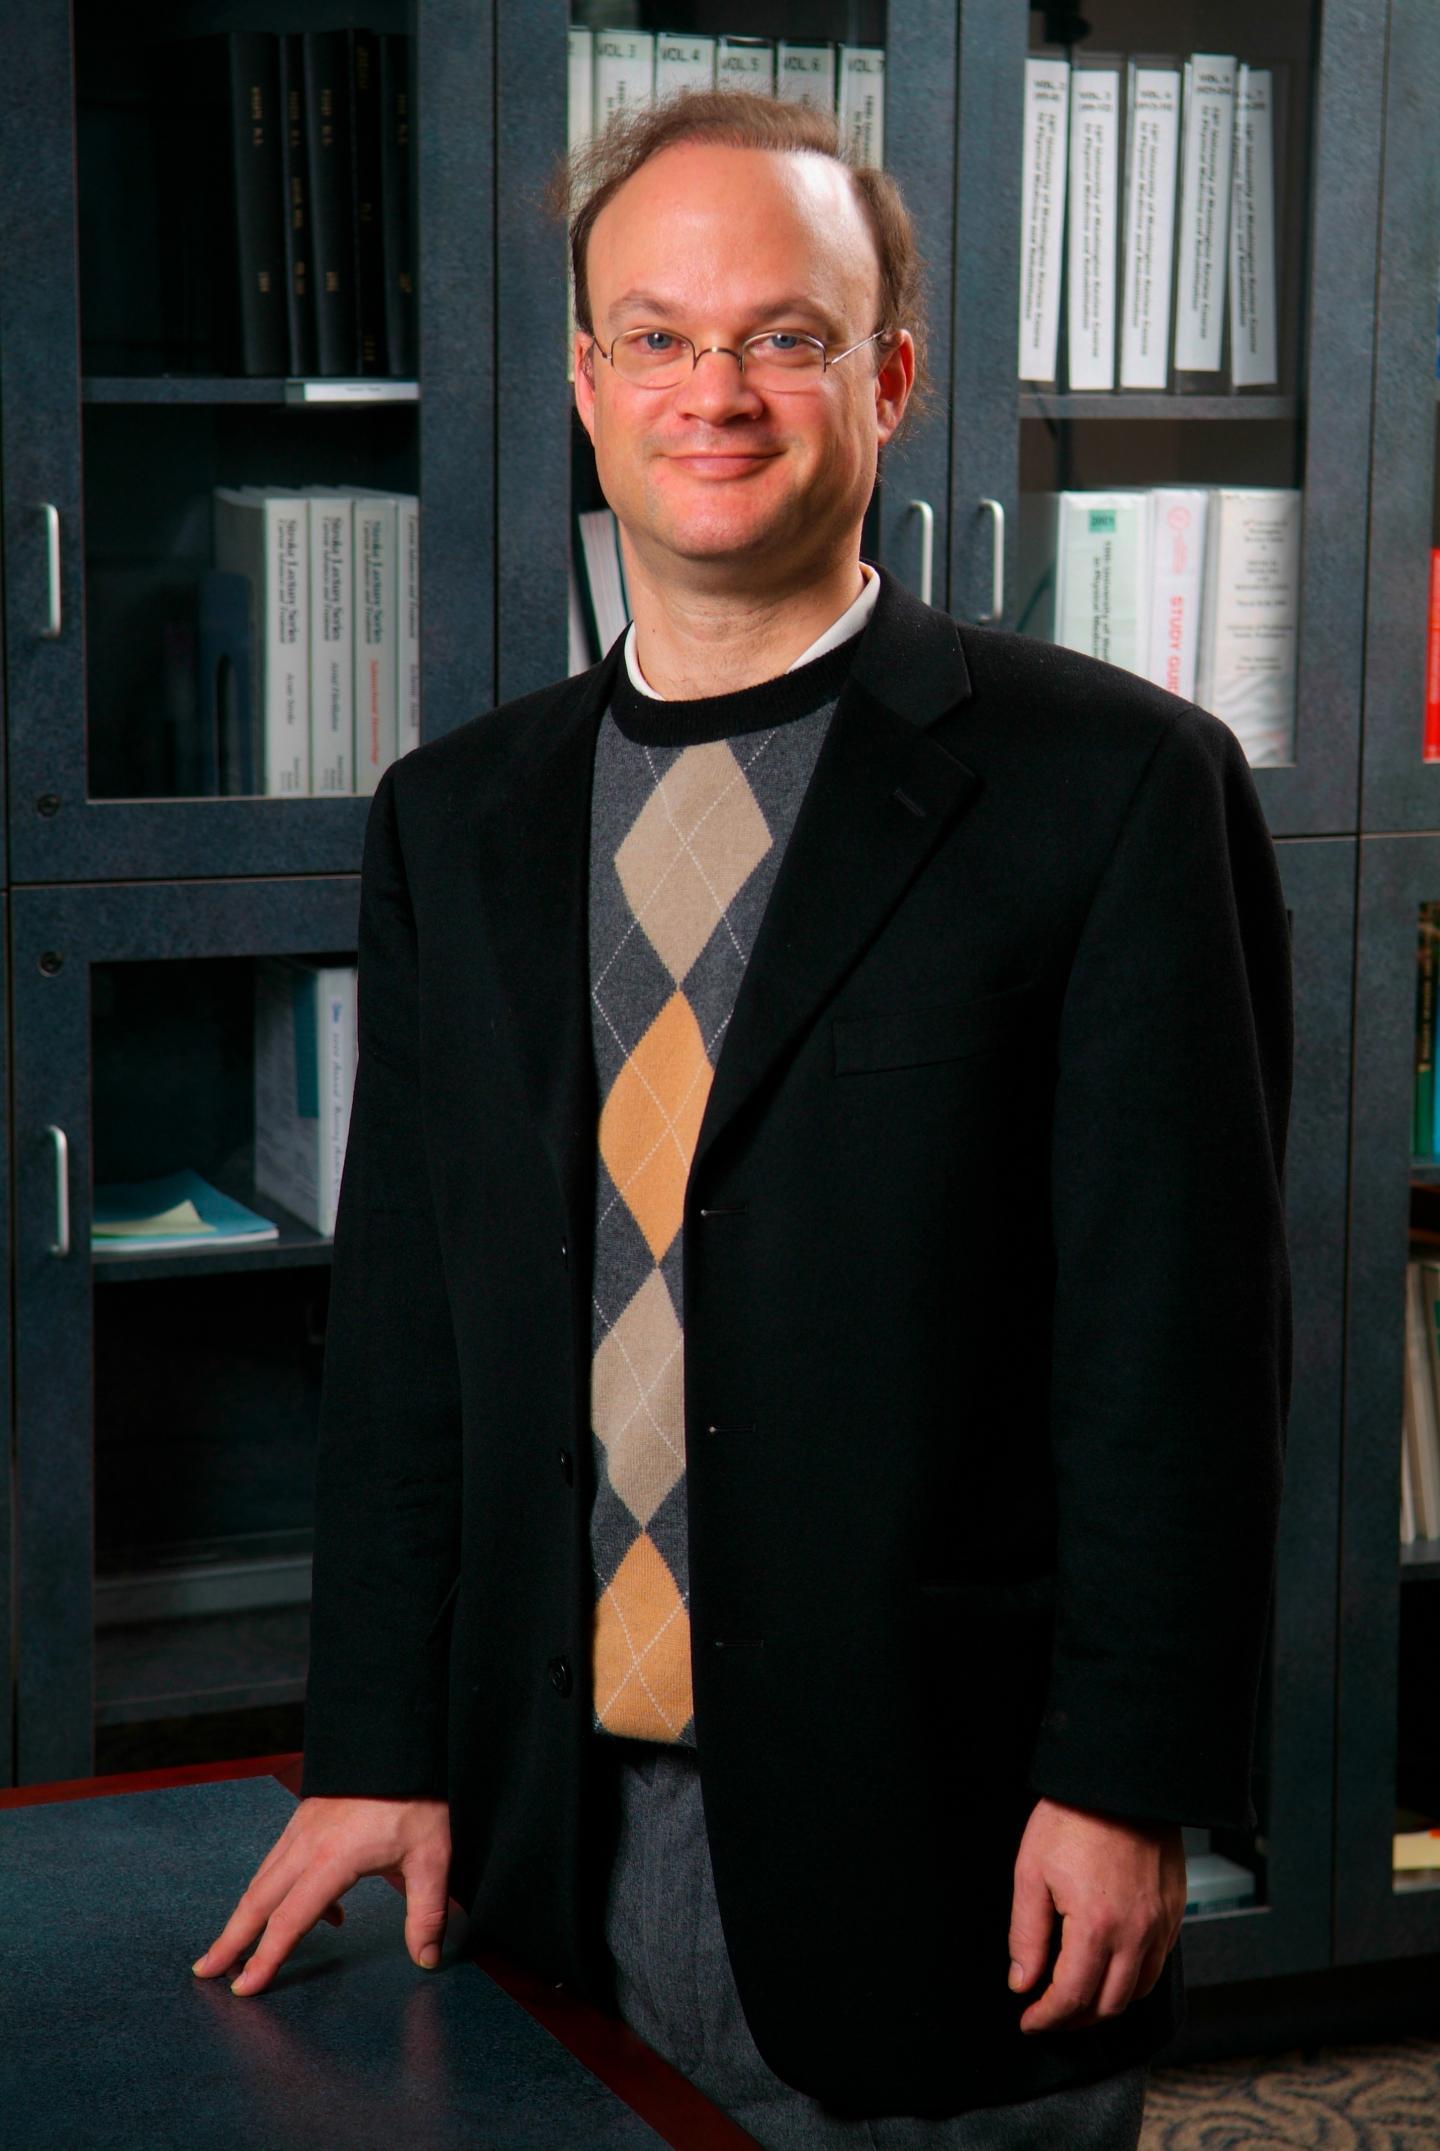 Jeffrey Lackner, University at Buffalo